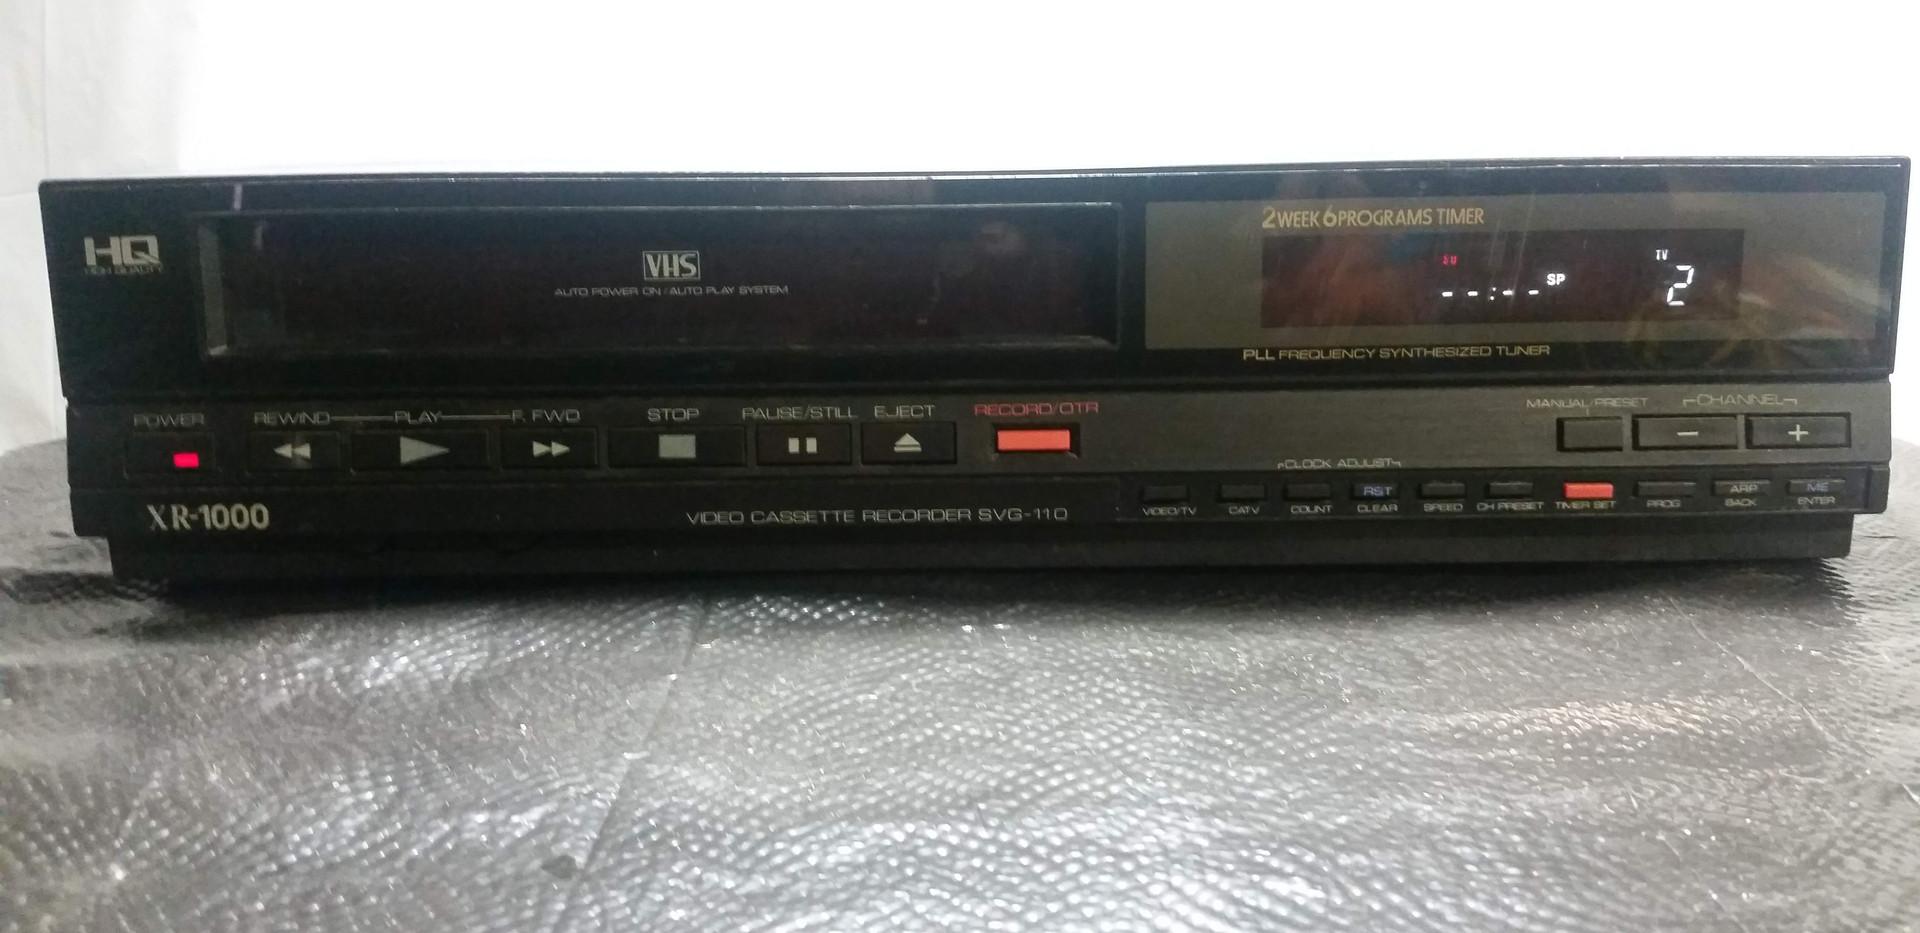 XR-1000 VHS Recorder